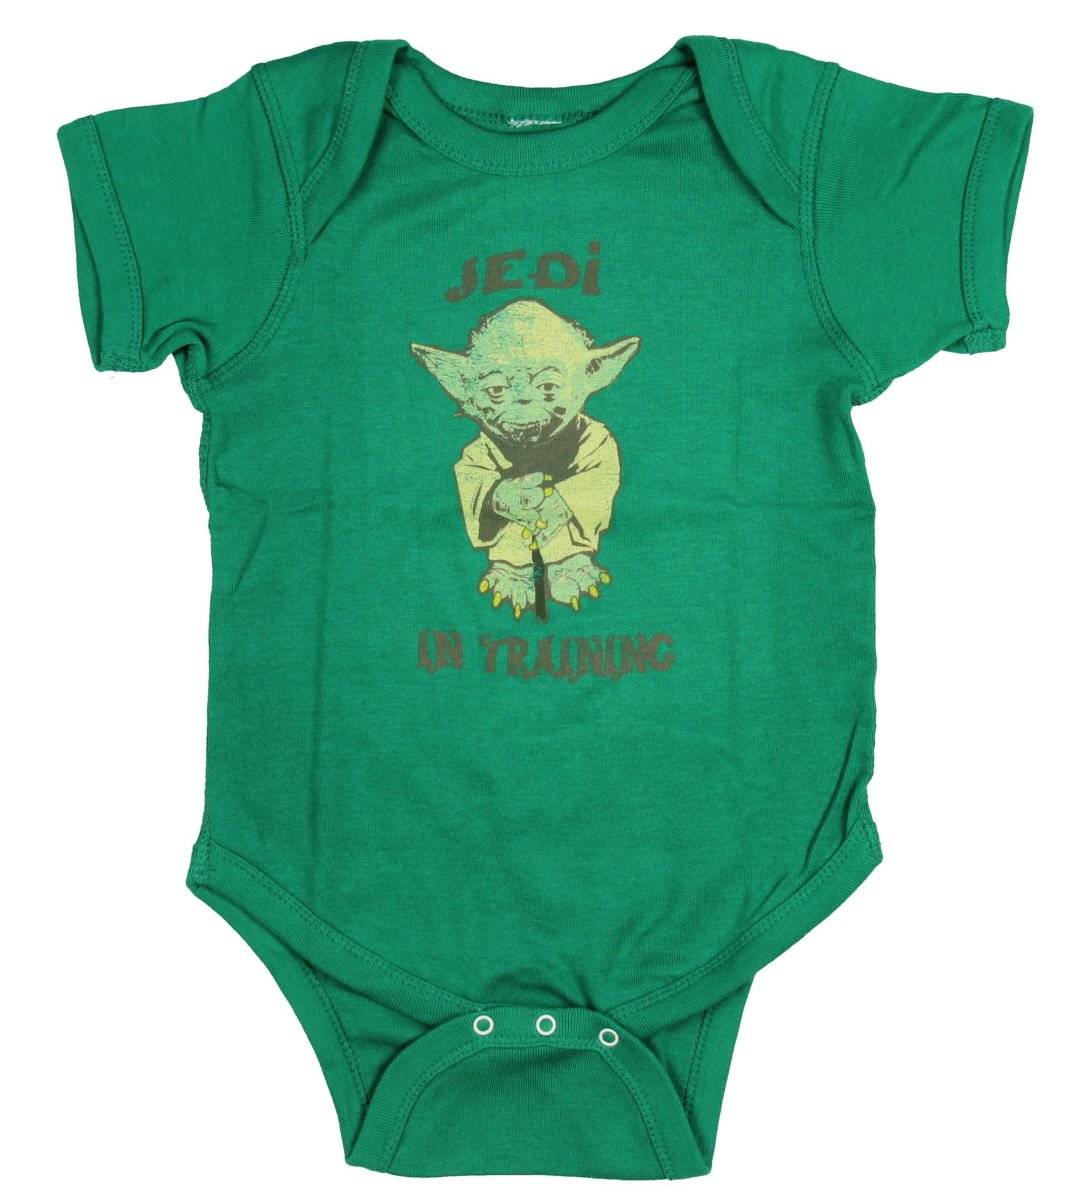 Yoda The Best Dad Star Wars Cute Unisex Baby Grow Bodysuit Vest New Arrival